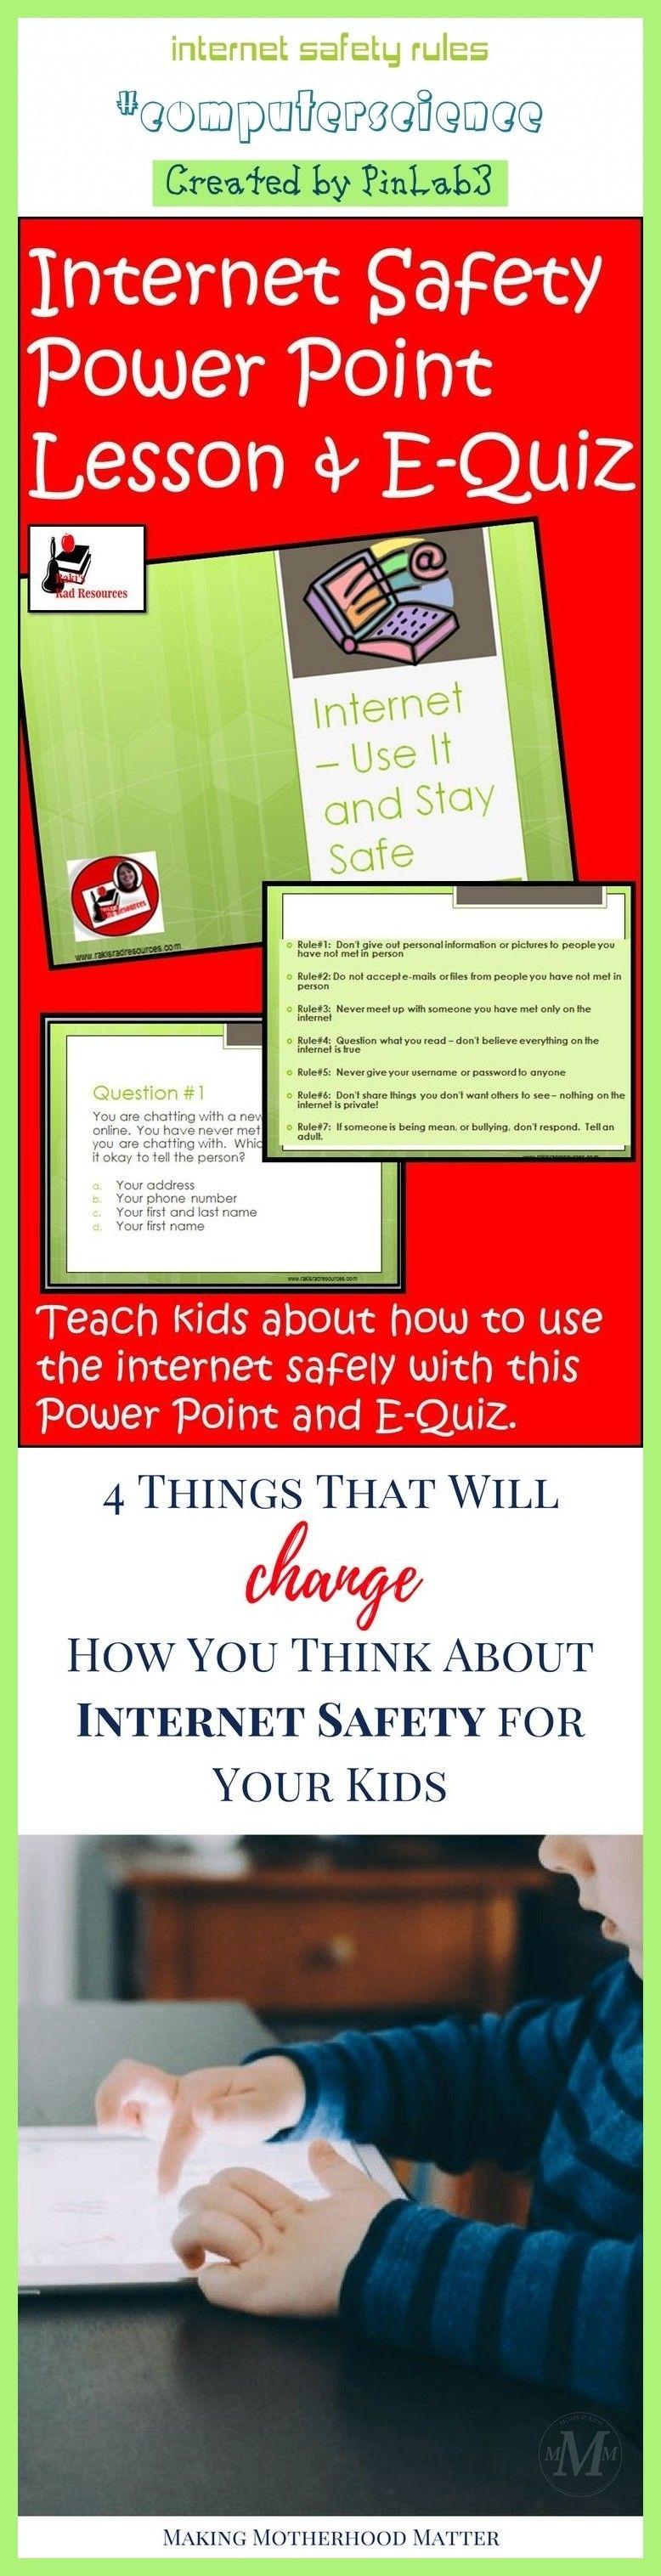 internet safety rules | Internet safety rules, Internet ...